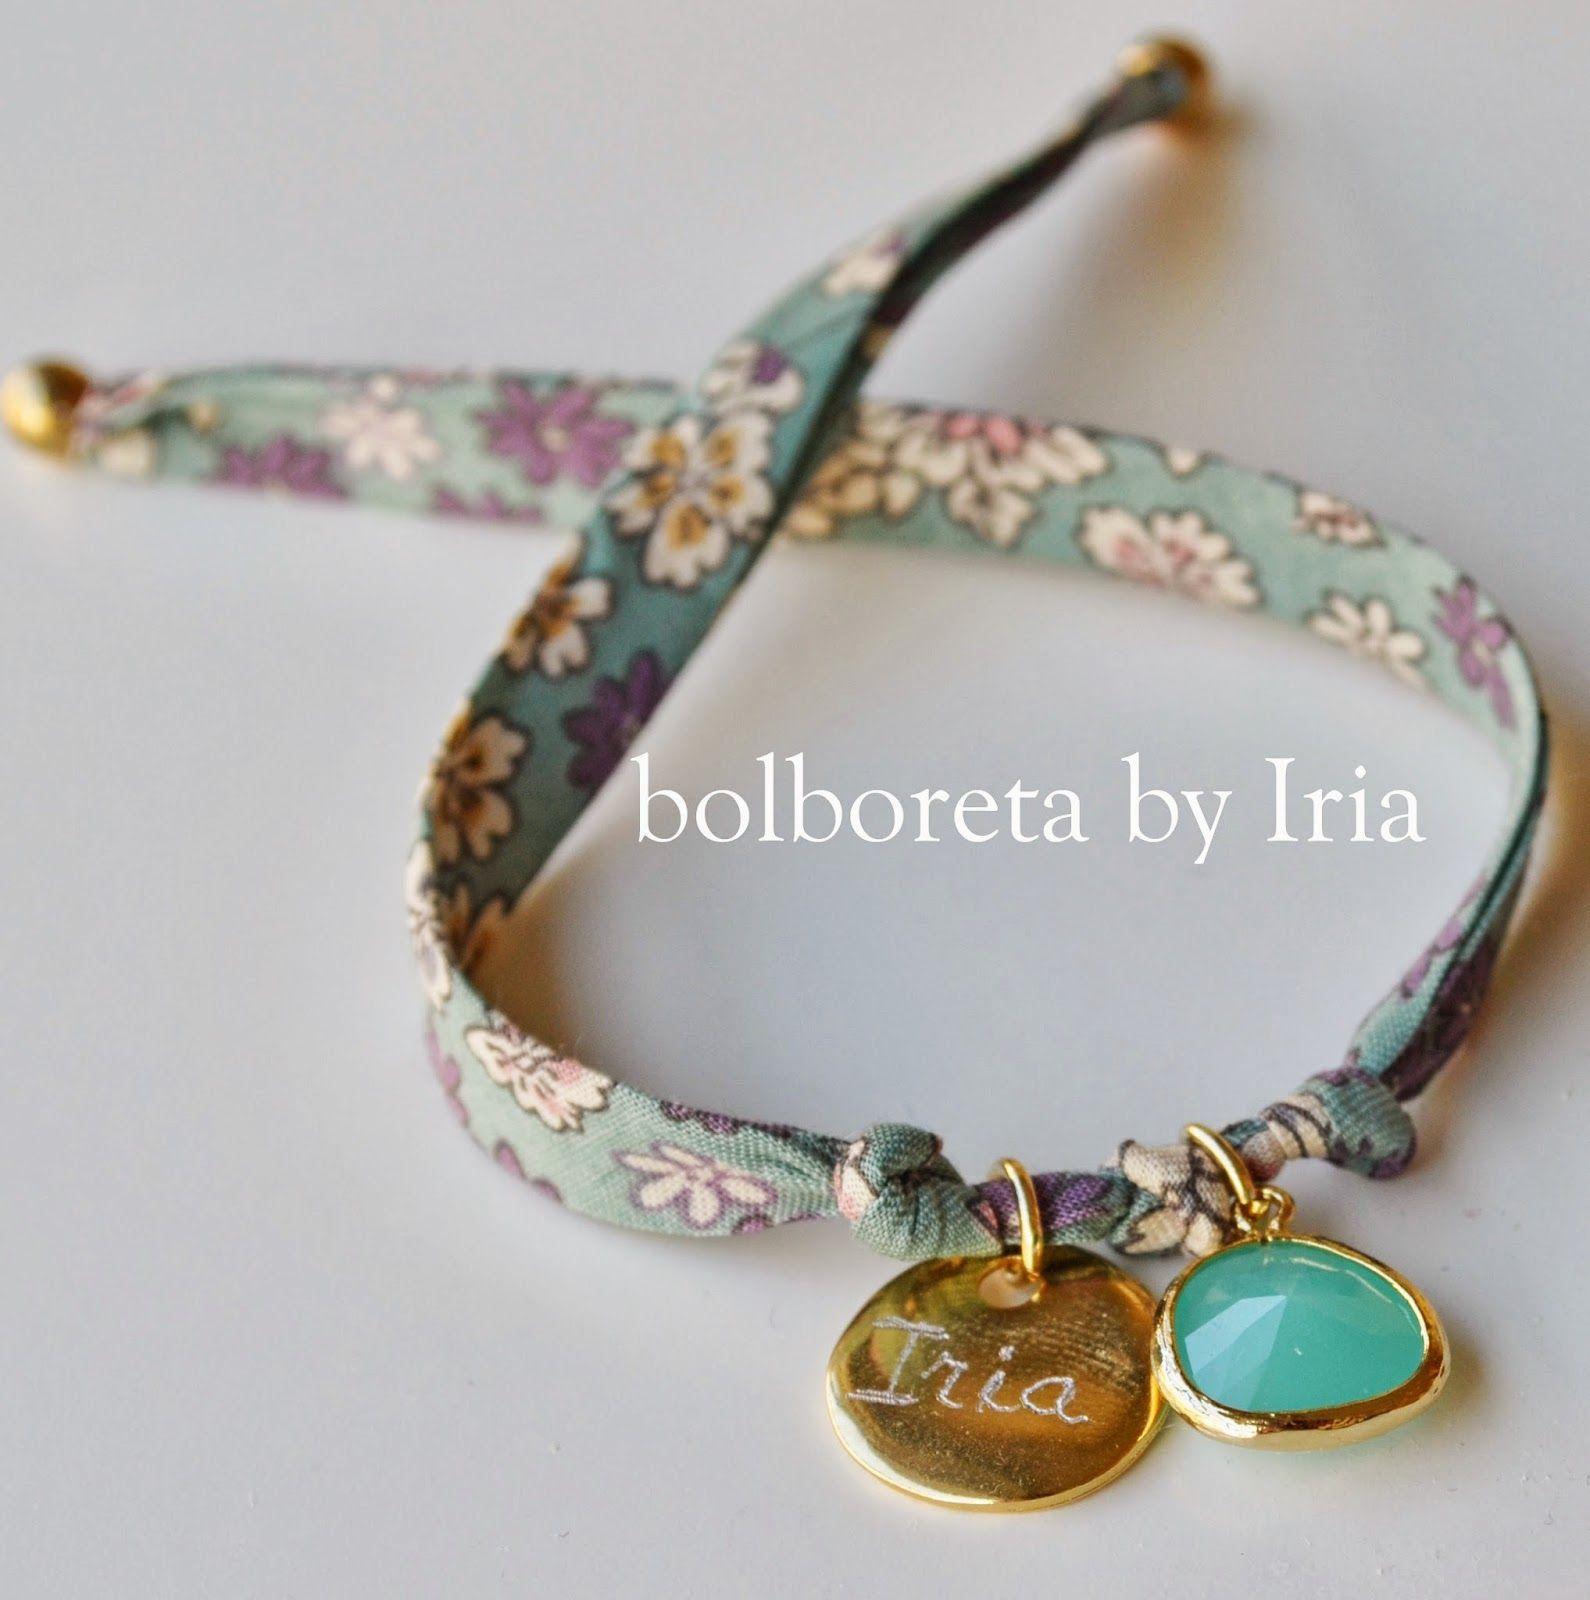 b07bfa9d849c Pulsera de tela liberty con ágatha y chapa personalizada | cuffs and ...